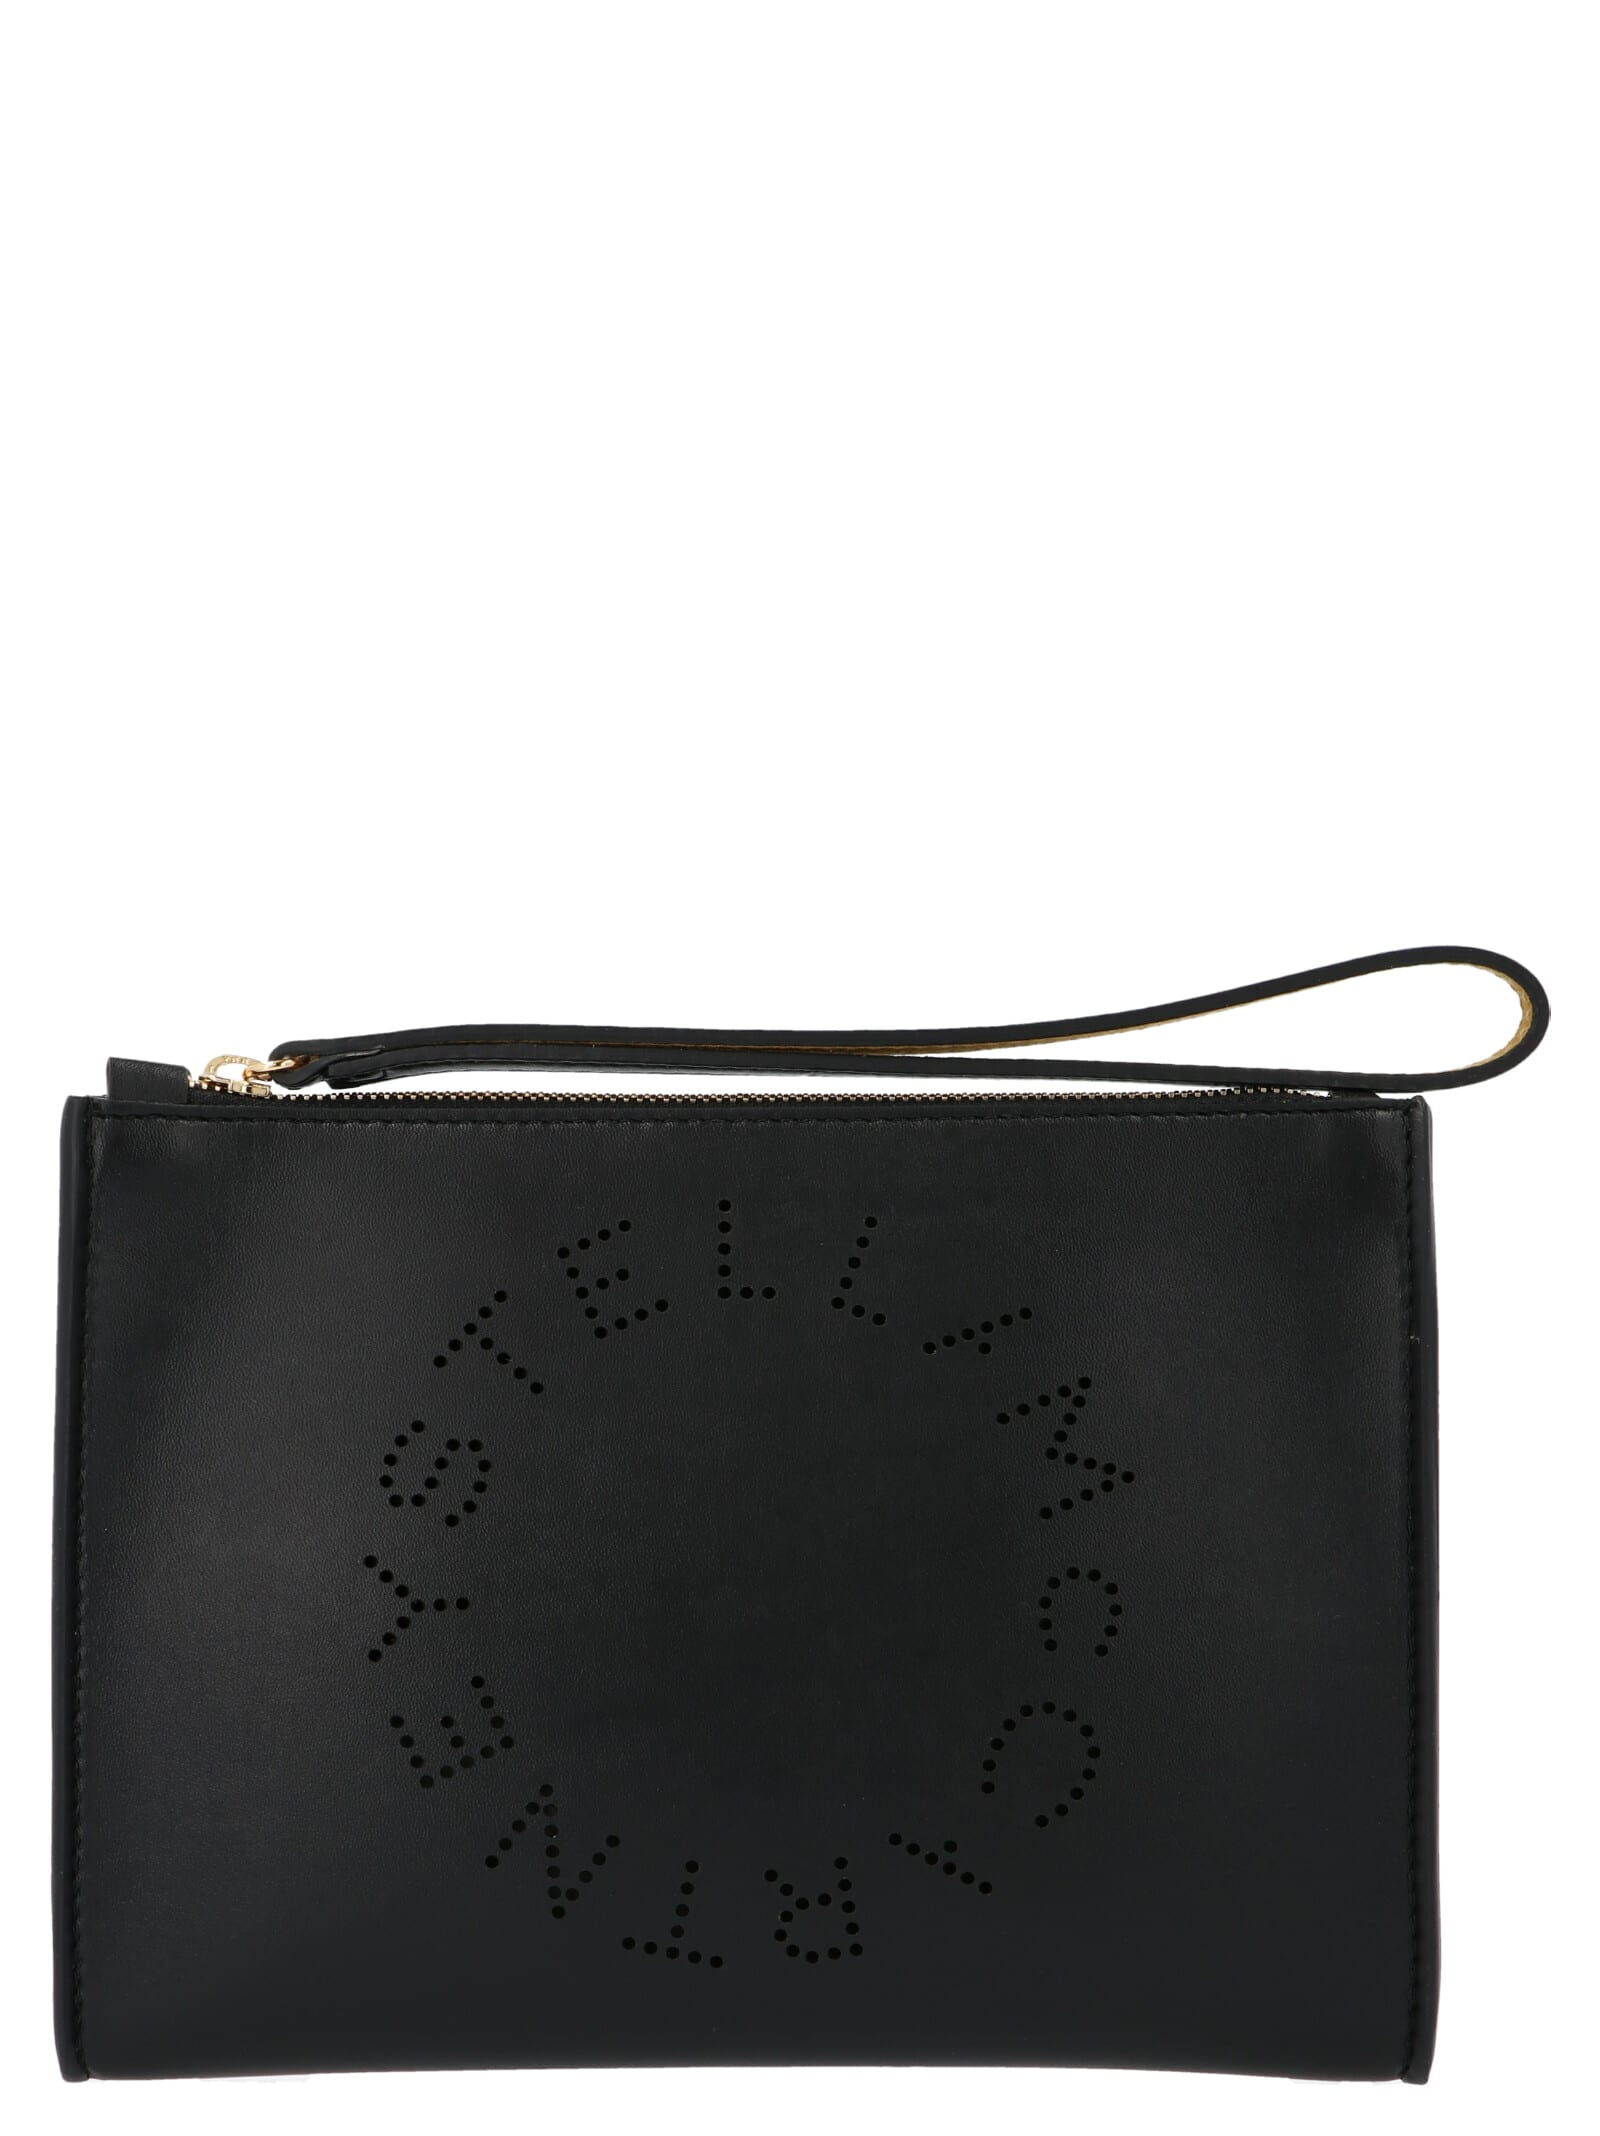 Stella Mccartney Stella Logo Bag In Black